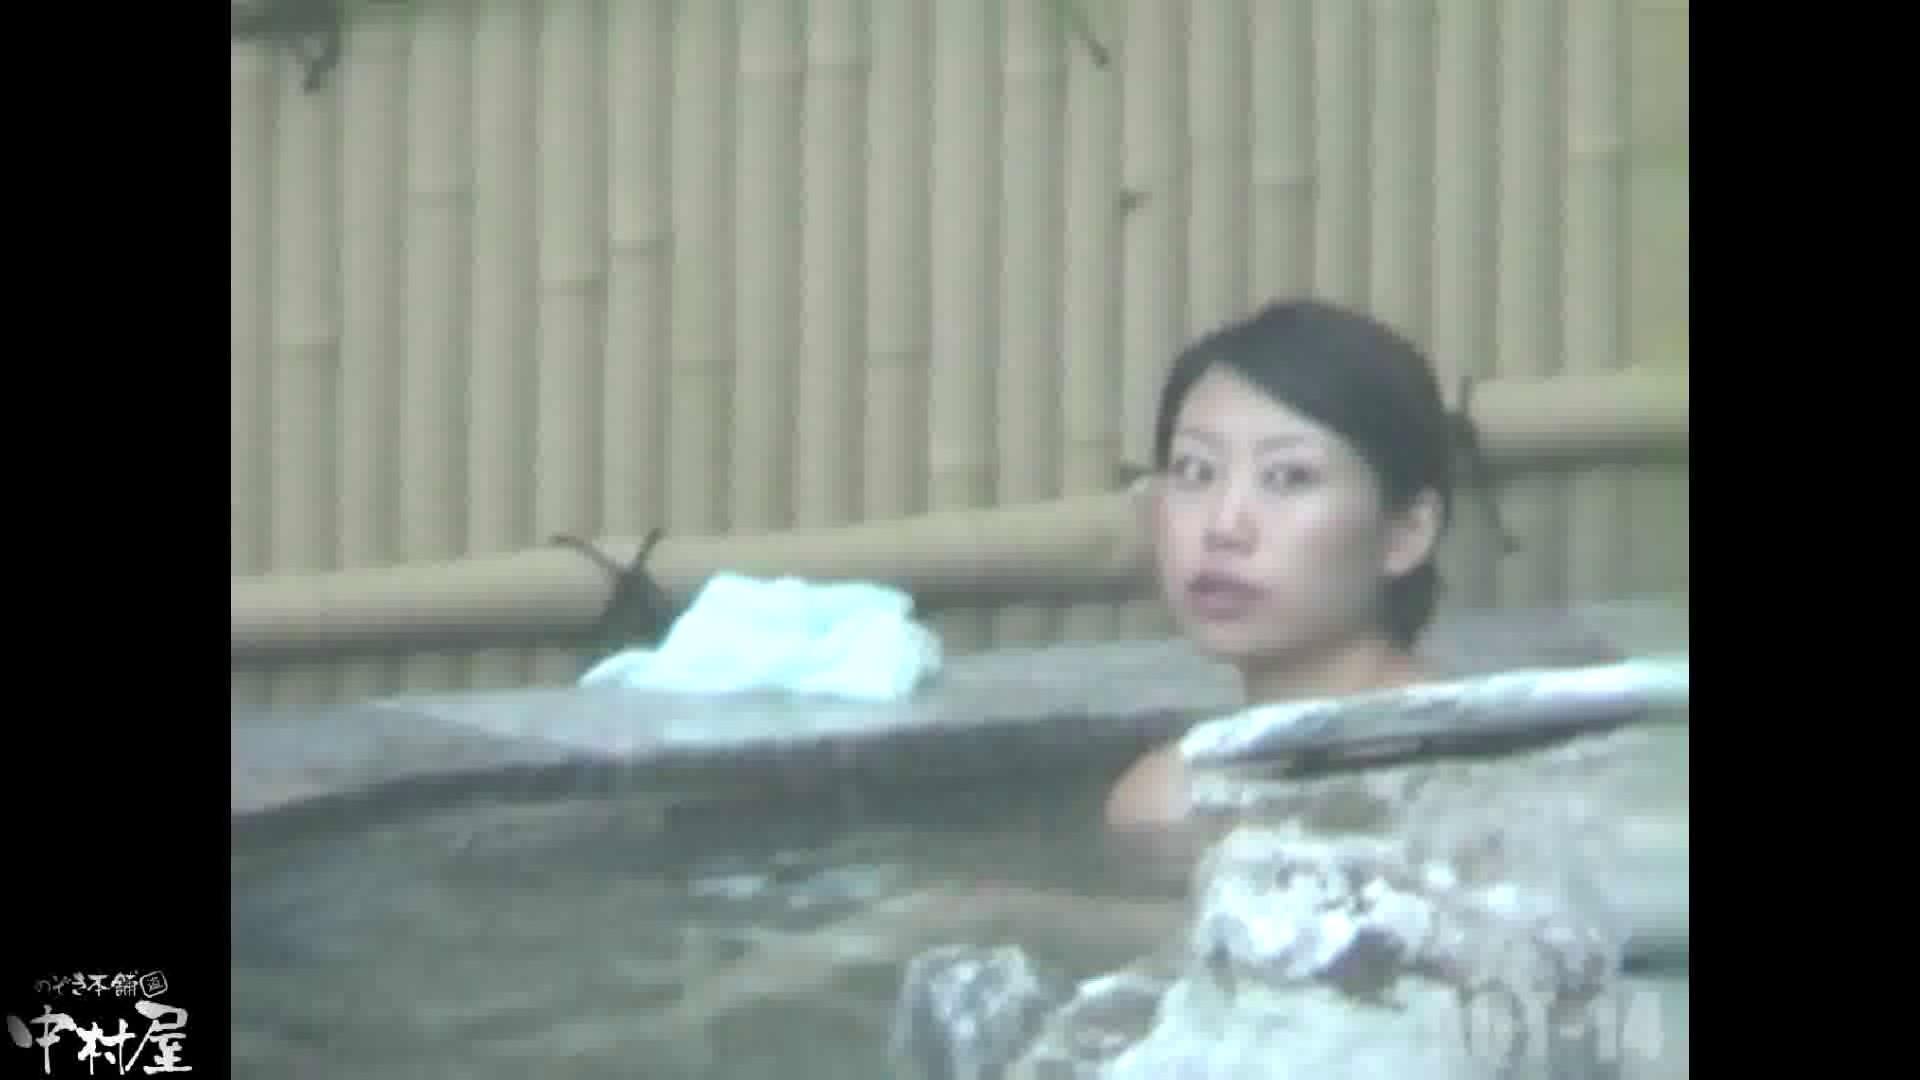 Aquaな露天風呂Vol.878潜入盗撮露天風呂十四判湯 其の一 潜入 AV無料動画キャプチャ 79PIX 23